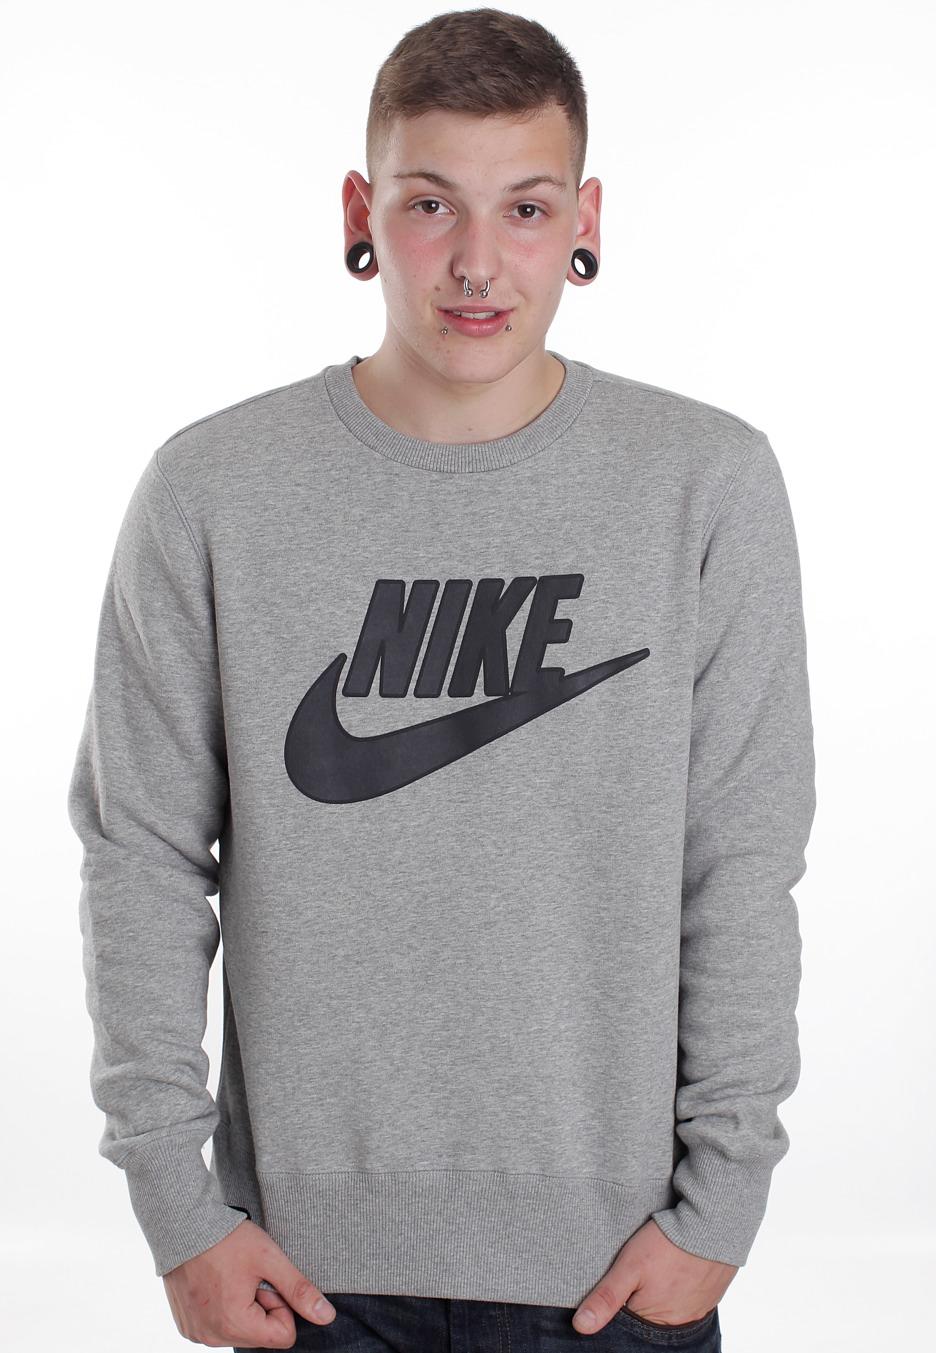 5c14b6192d5c Nike - Brushed Dark Grey Heather - Sweater - Streetwear Shop -  Impericon.com Worldwide